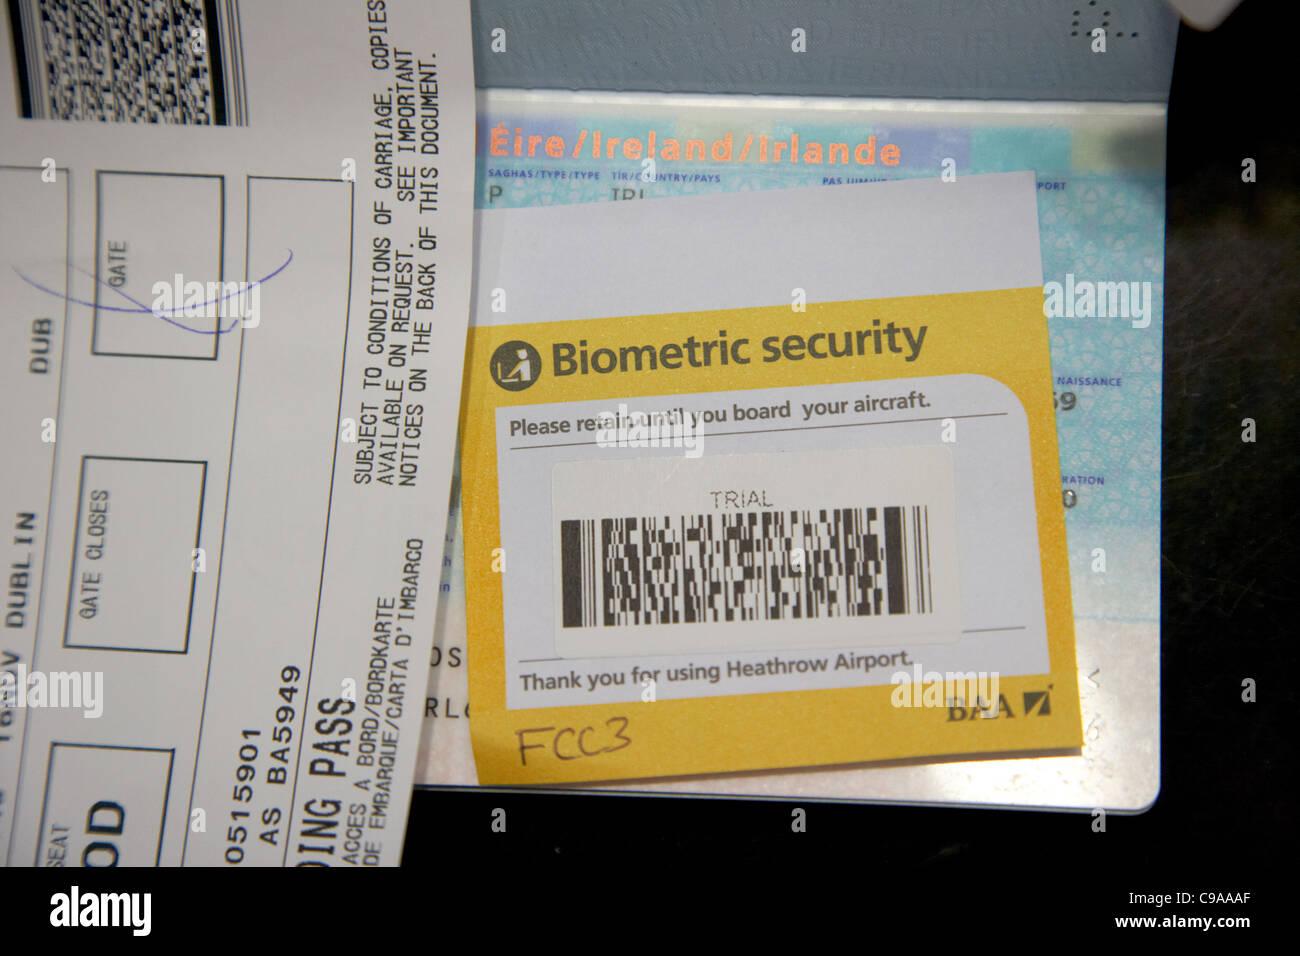 uk border control biometric security trial barcode sticker inserted in an eu irish passport at heathrow airport - Stock Image